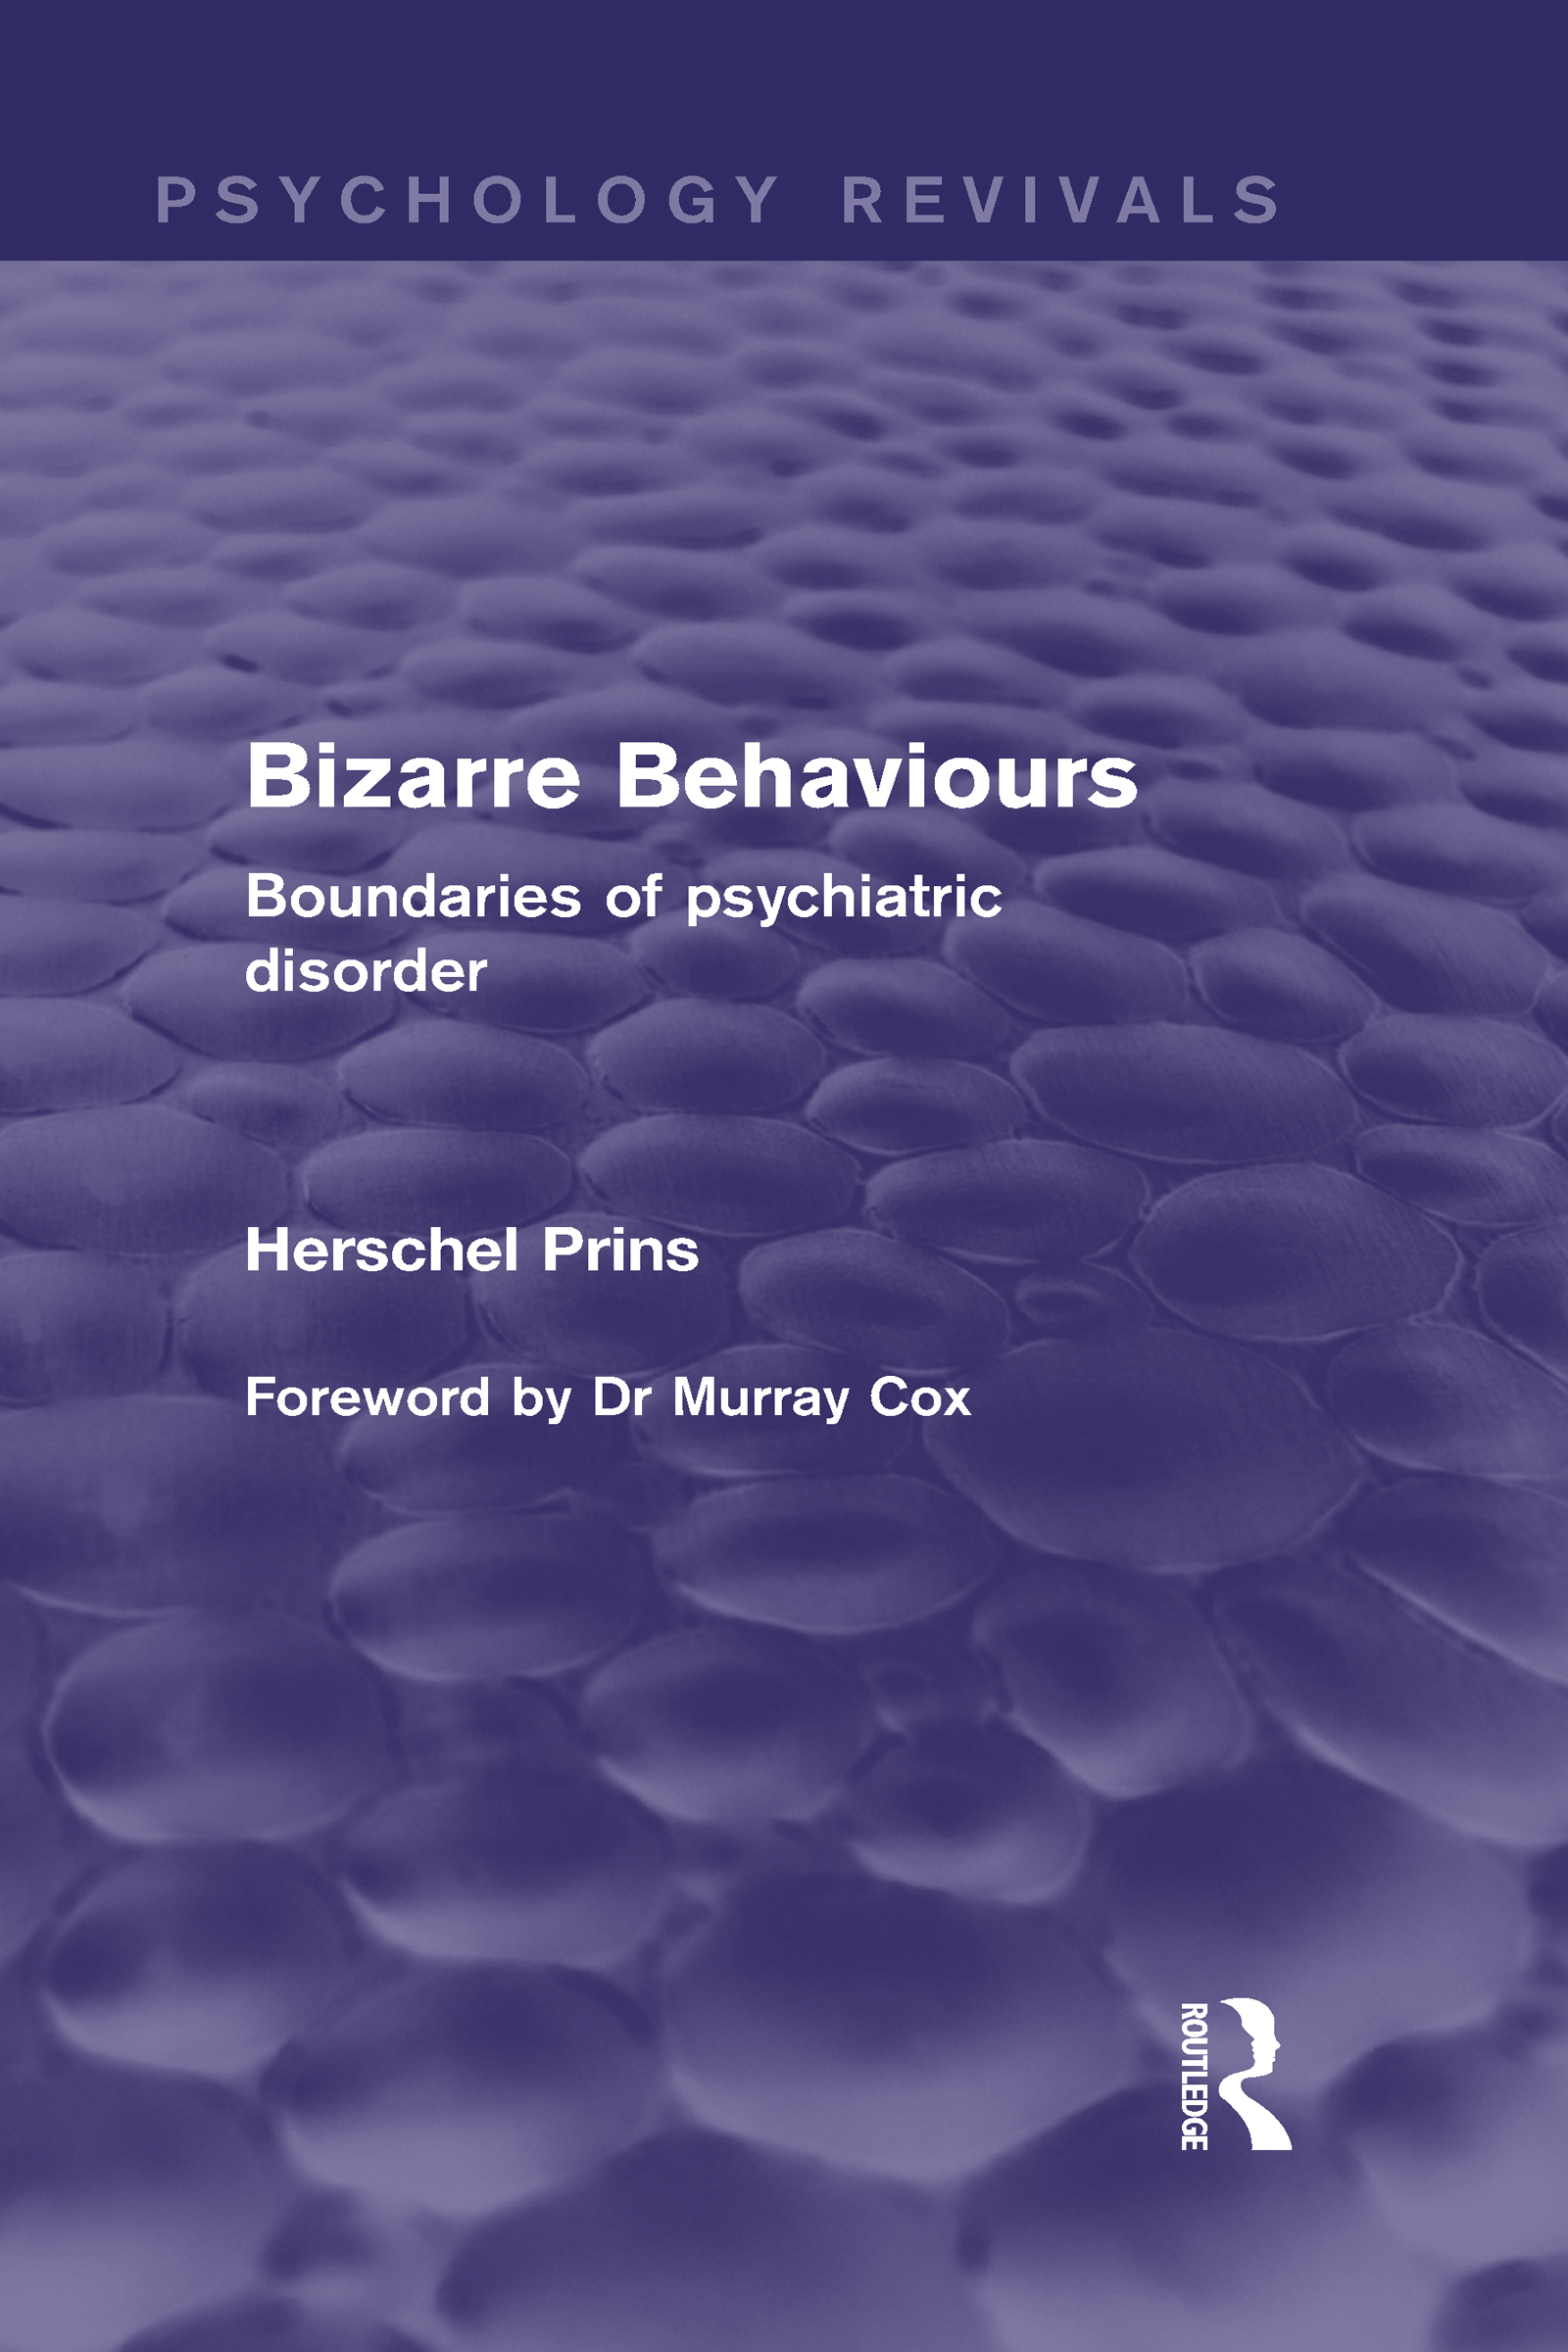 Bizarre Behaviours (Psychology Revivals): Boundaries of Psychiatric Disorder (Hardback) book cover